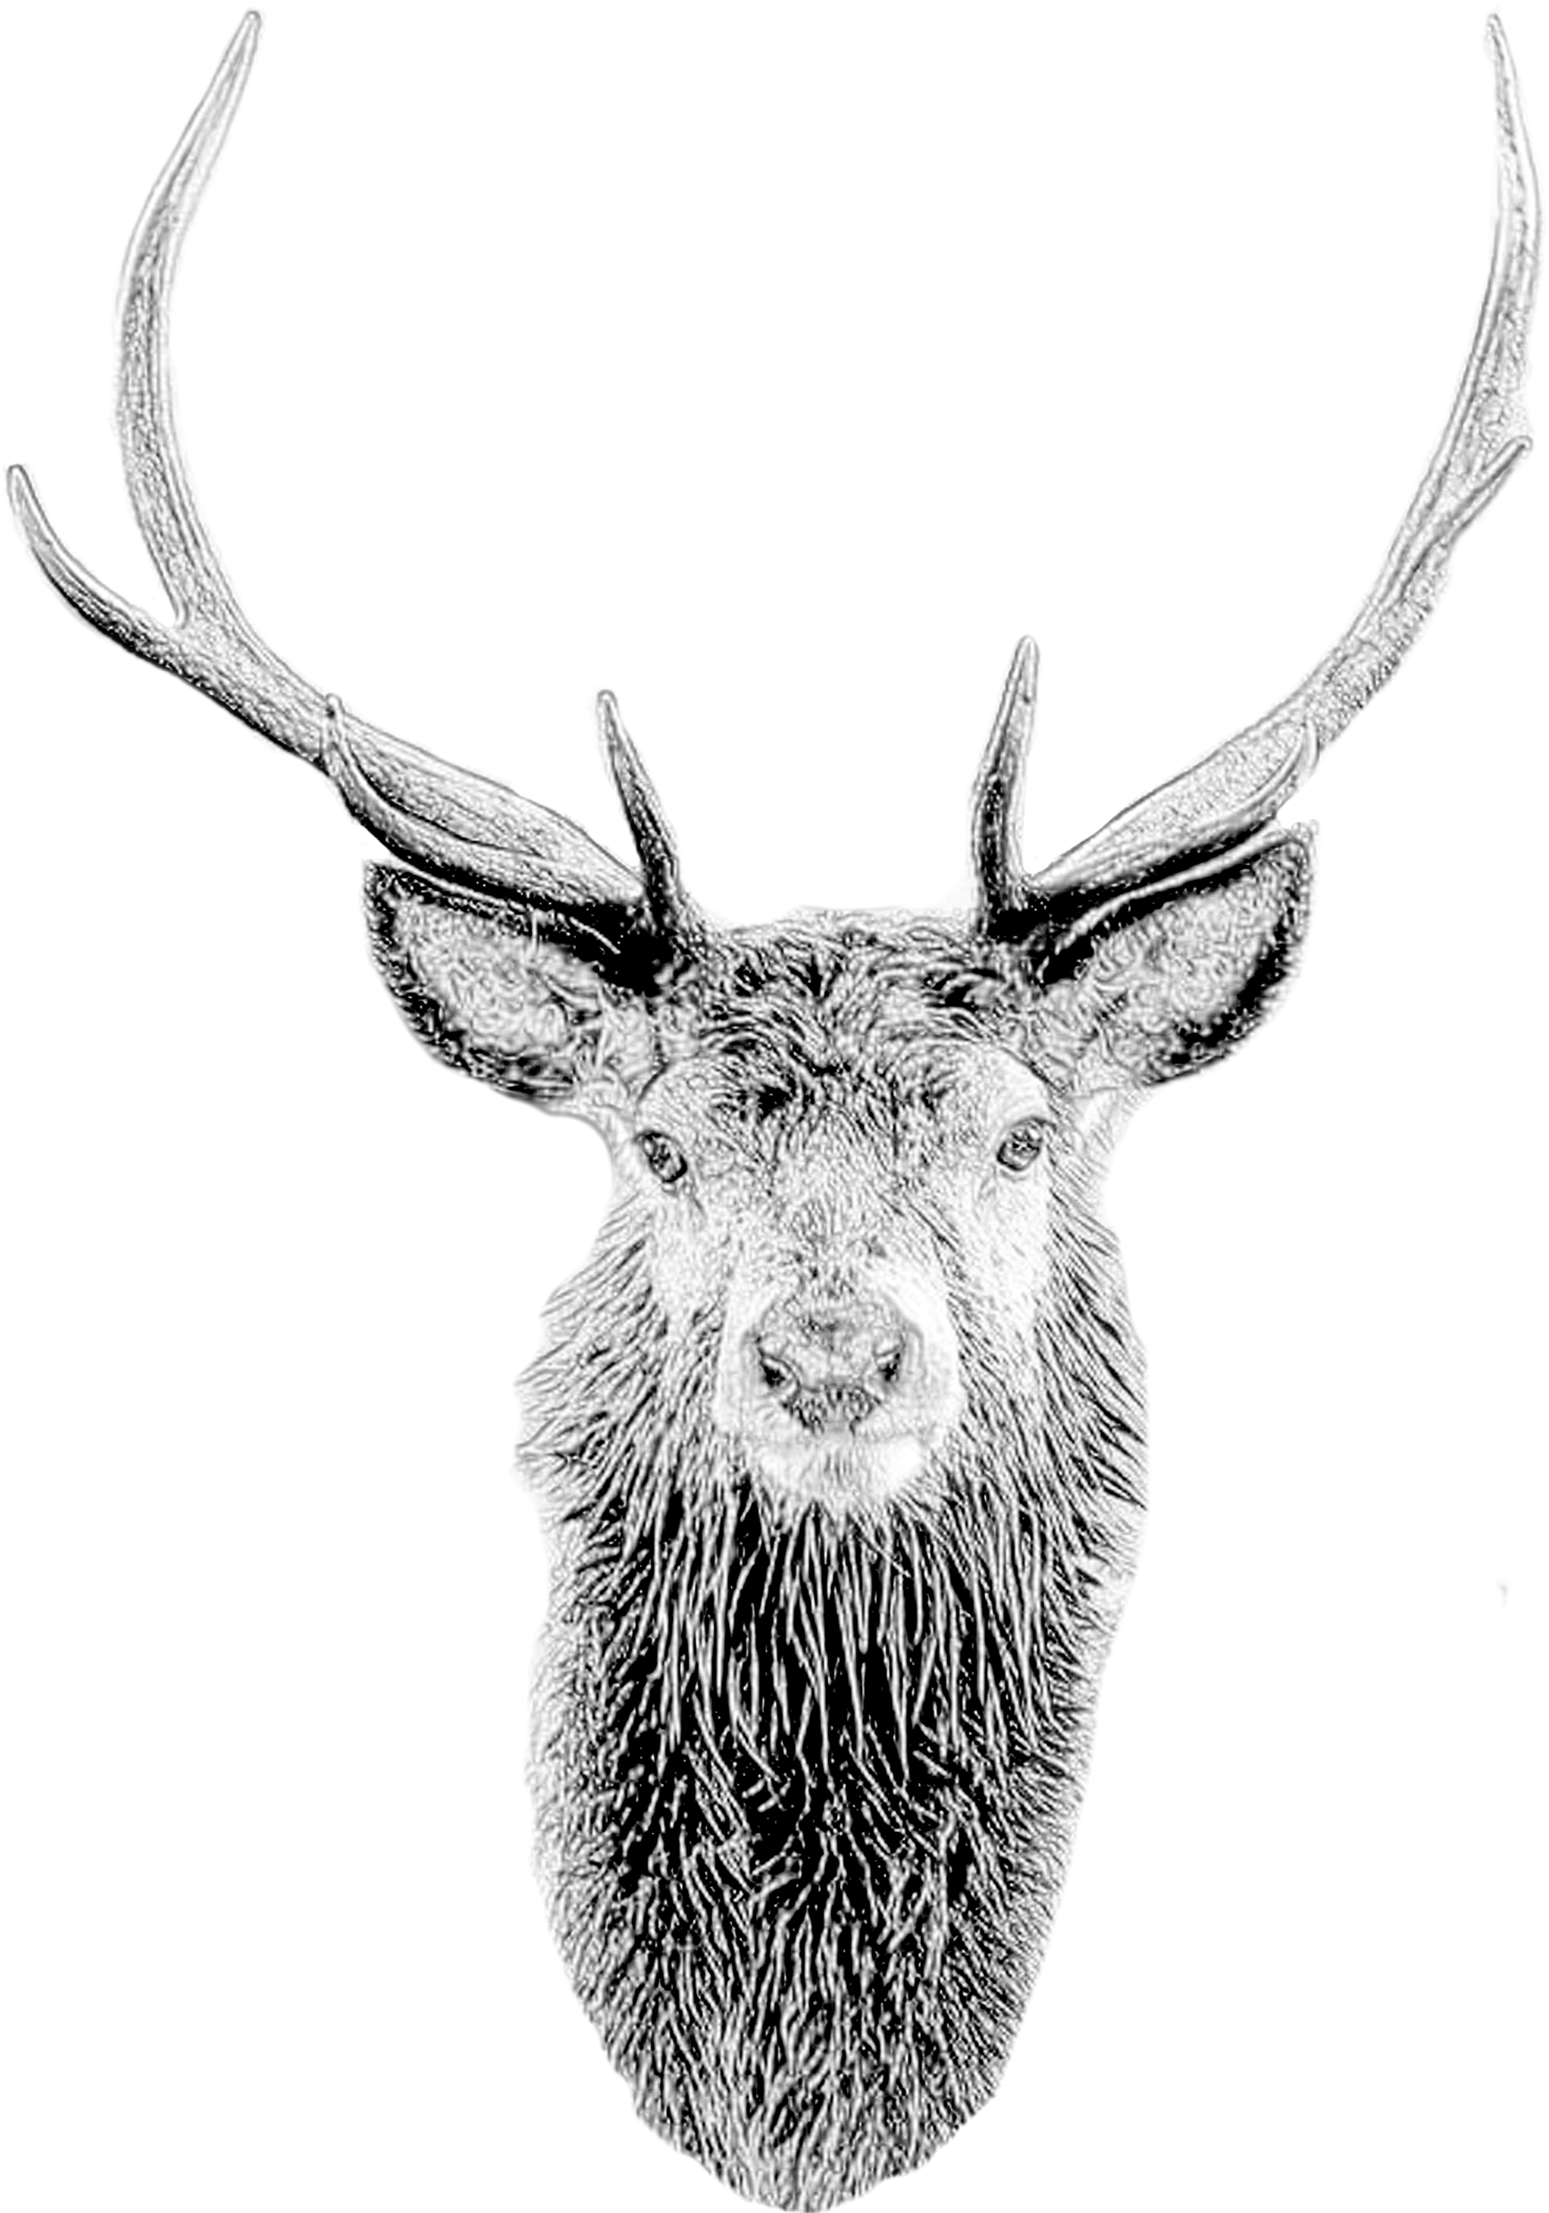 Deer Mask Deer Head Stag Mask Printable Diy Pdf Template Sketch Clipart Large Size Png Image Pikpng